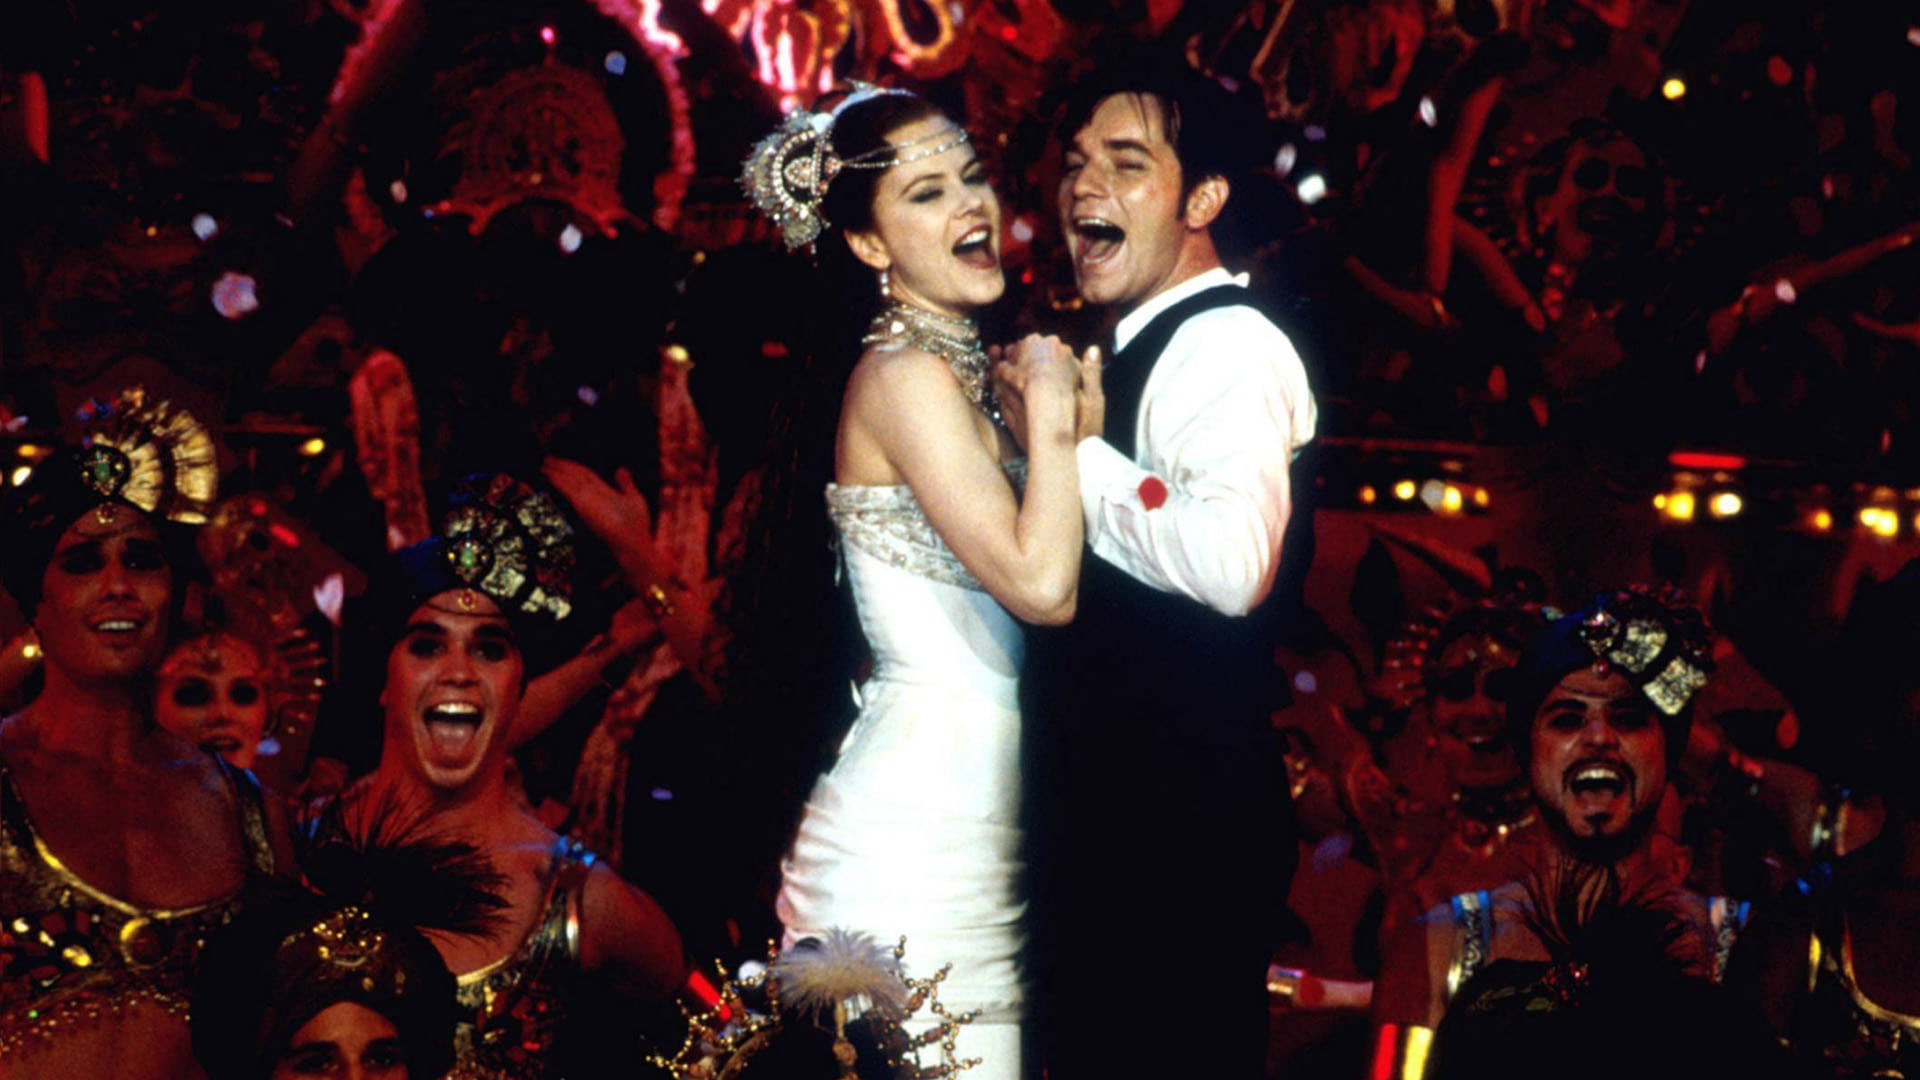 Moulin Rouge! backdrop